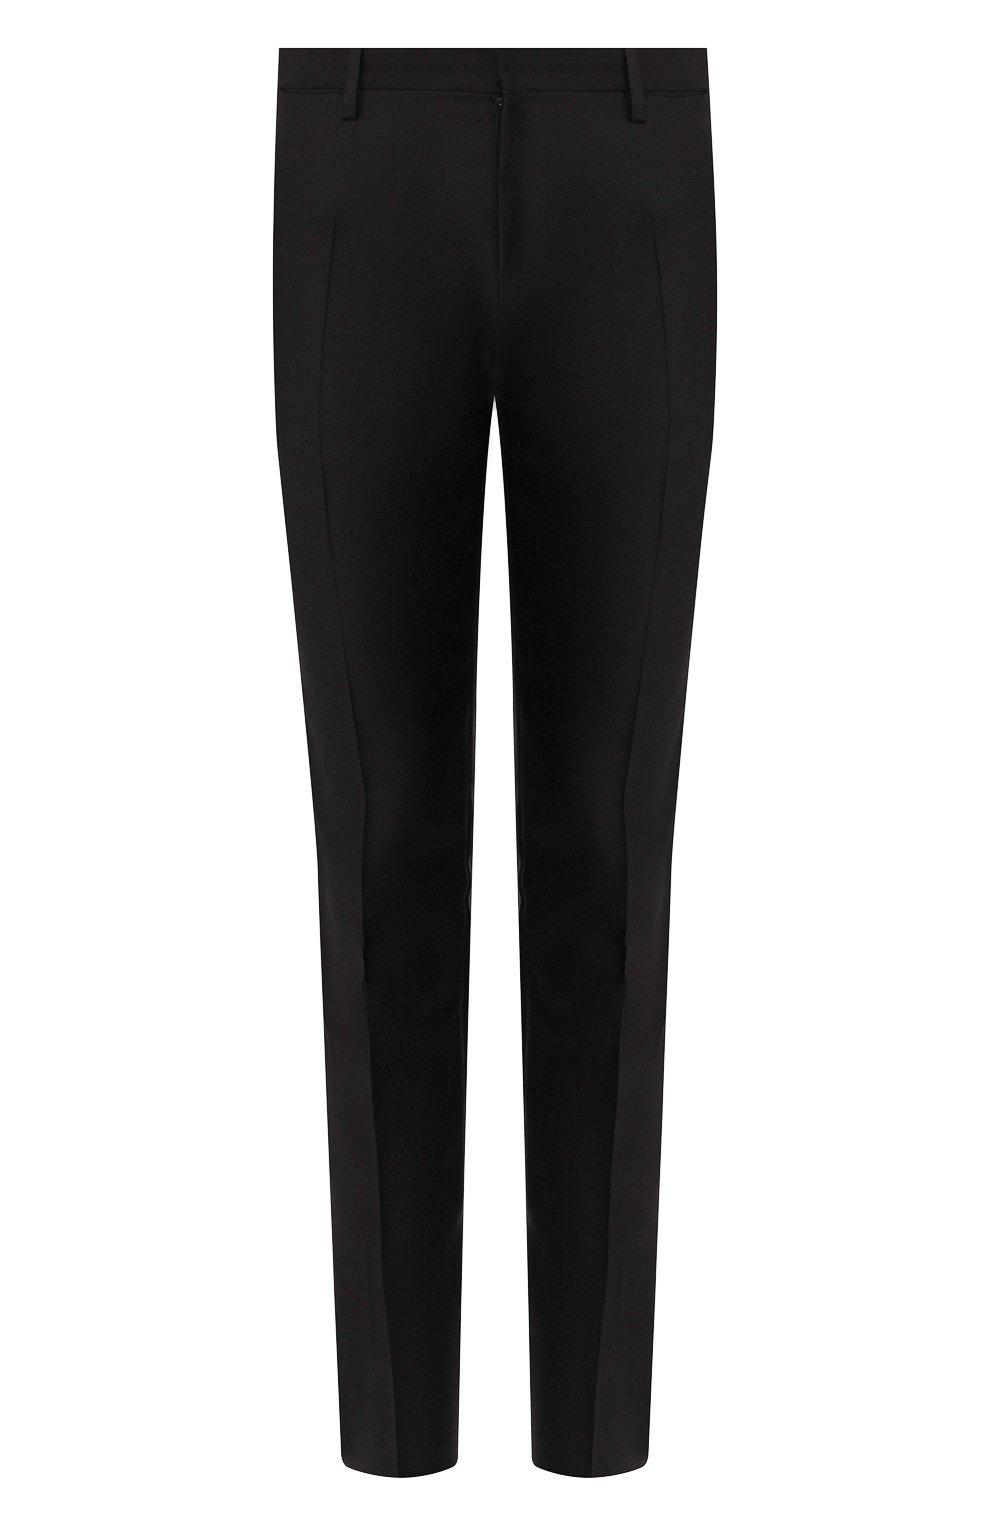 Мужские брюки из смеси шерсти и шелка DSQUARED2 черного цвета, арт. S74KB0379/S39408 | Фото 1